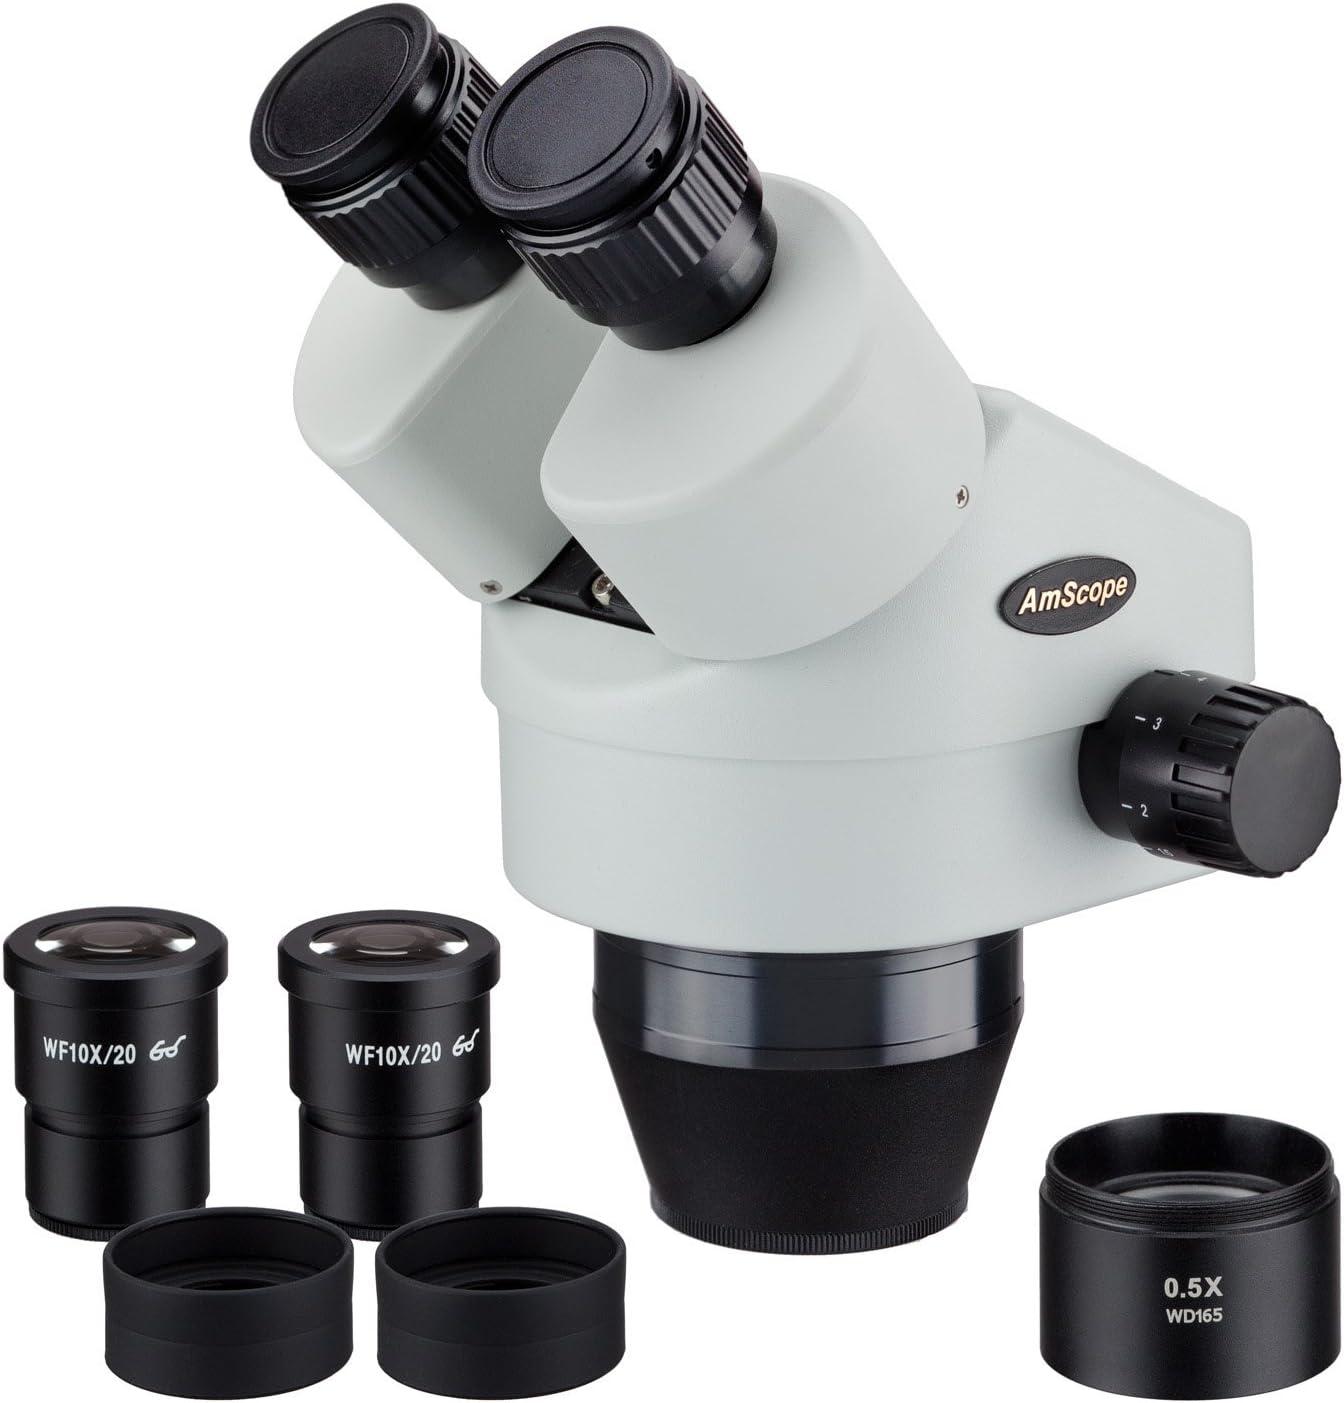 AmScope SM3545B Max 42% OFF 3.5X-45X Binocular Zoom Power trend rank Stereo Microscope